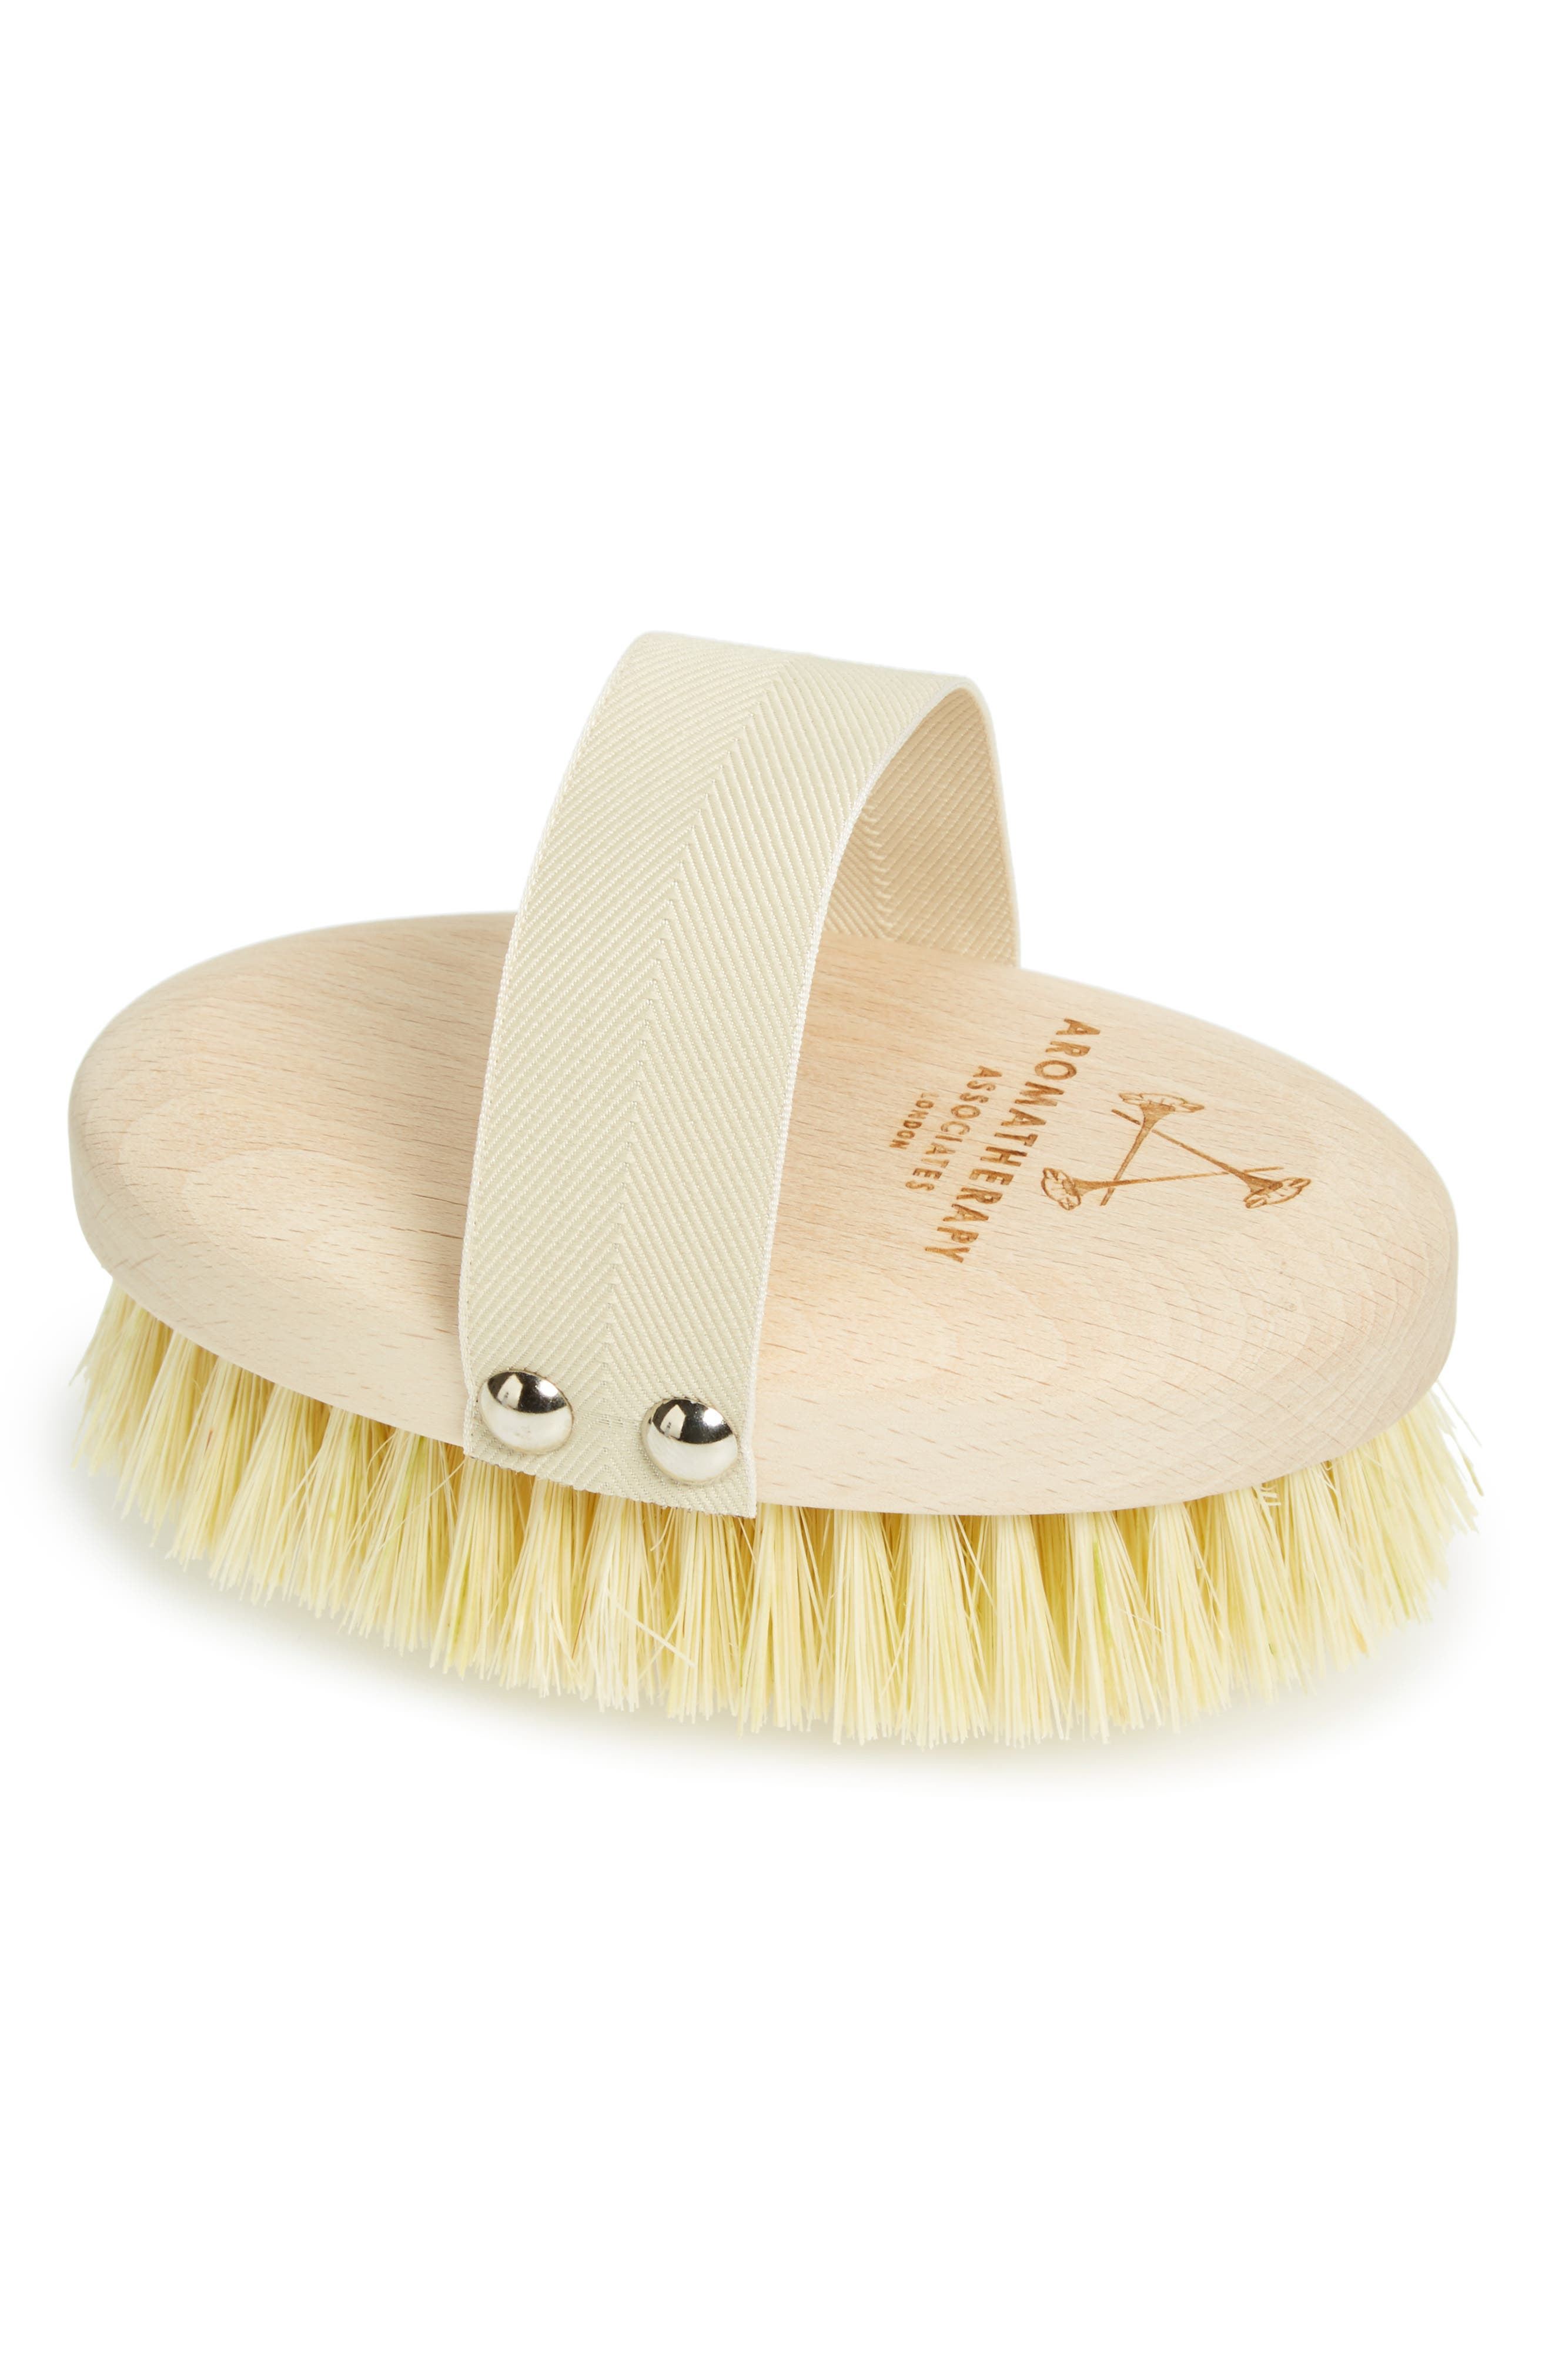 AROMATHERAPY ASSOCIATES Polishing Body Brush, Main, color, NONE